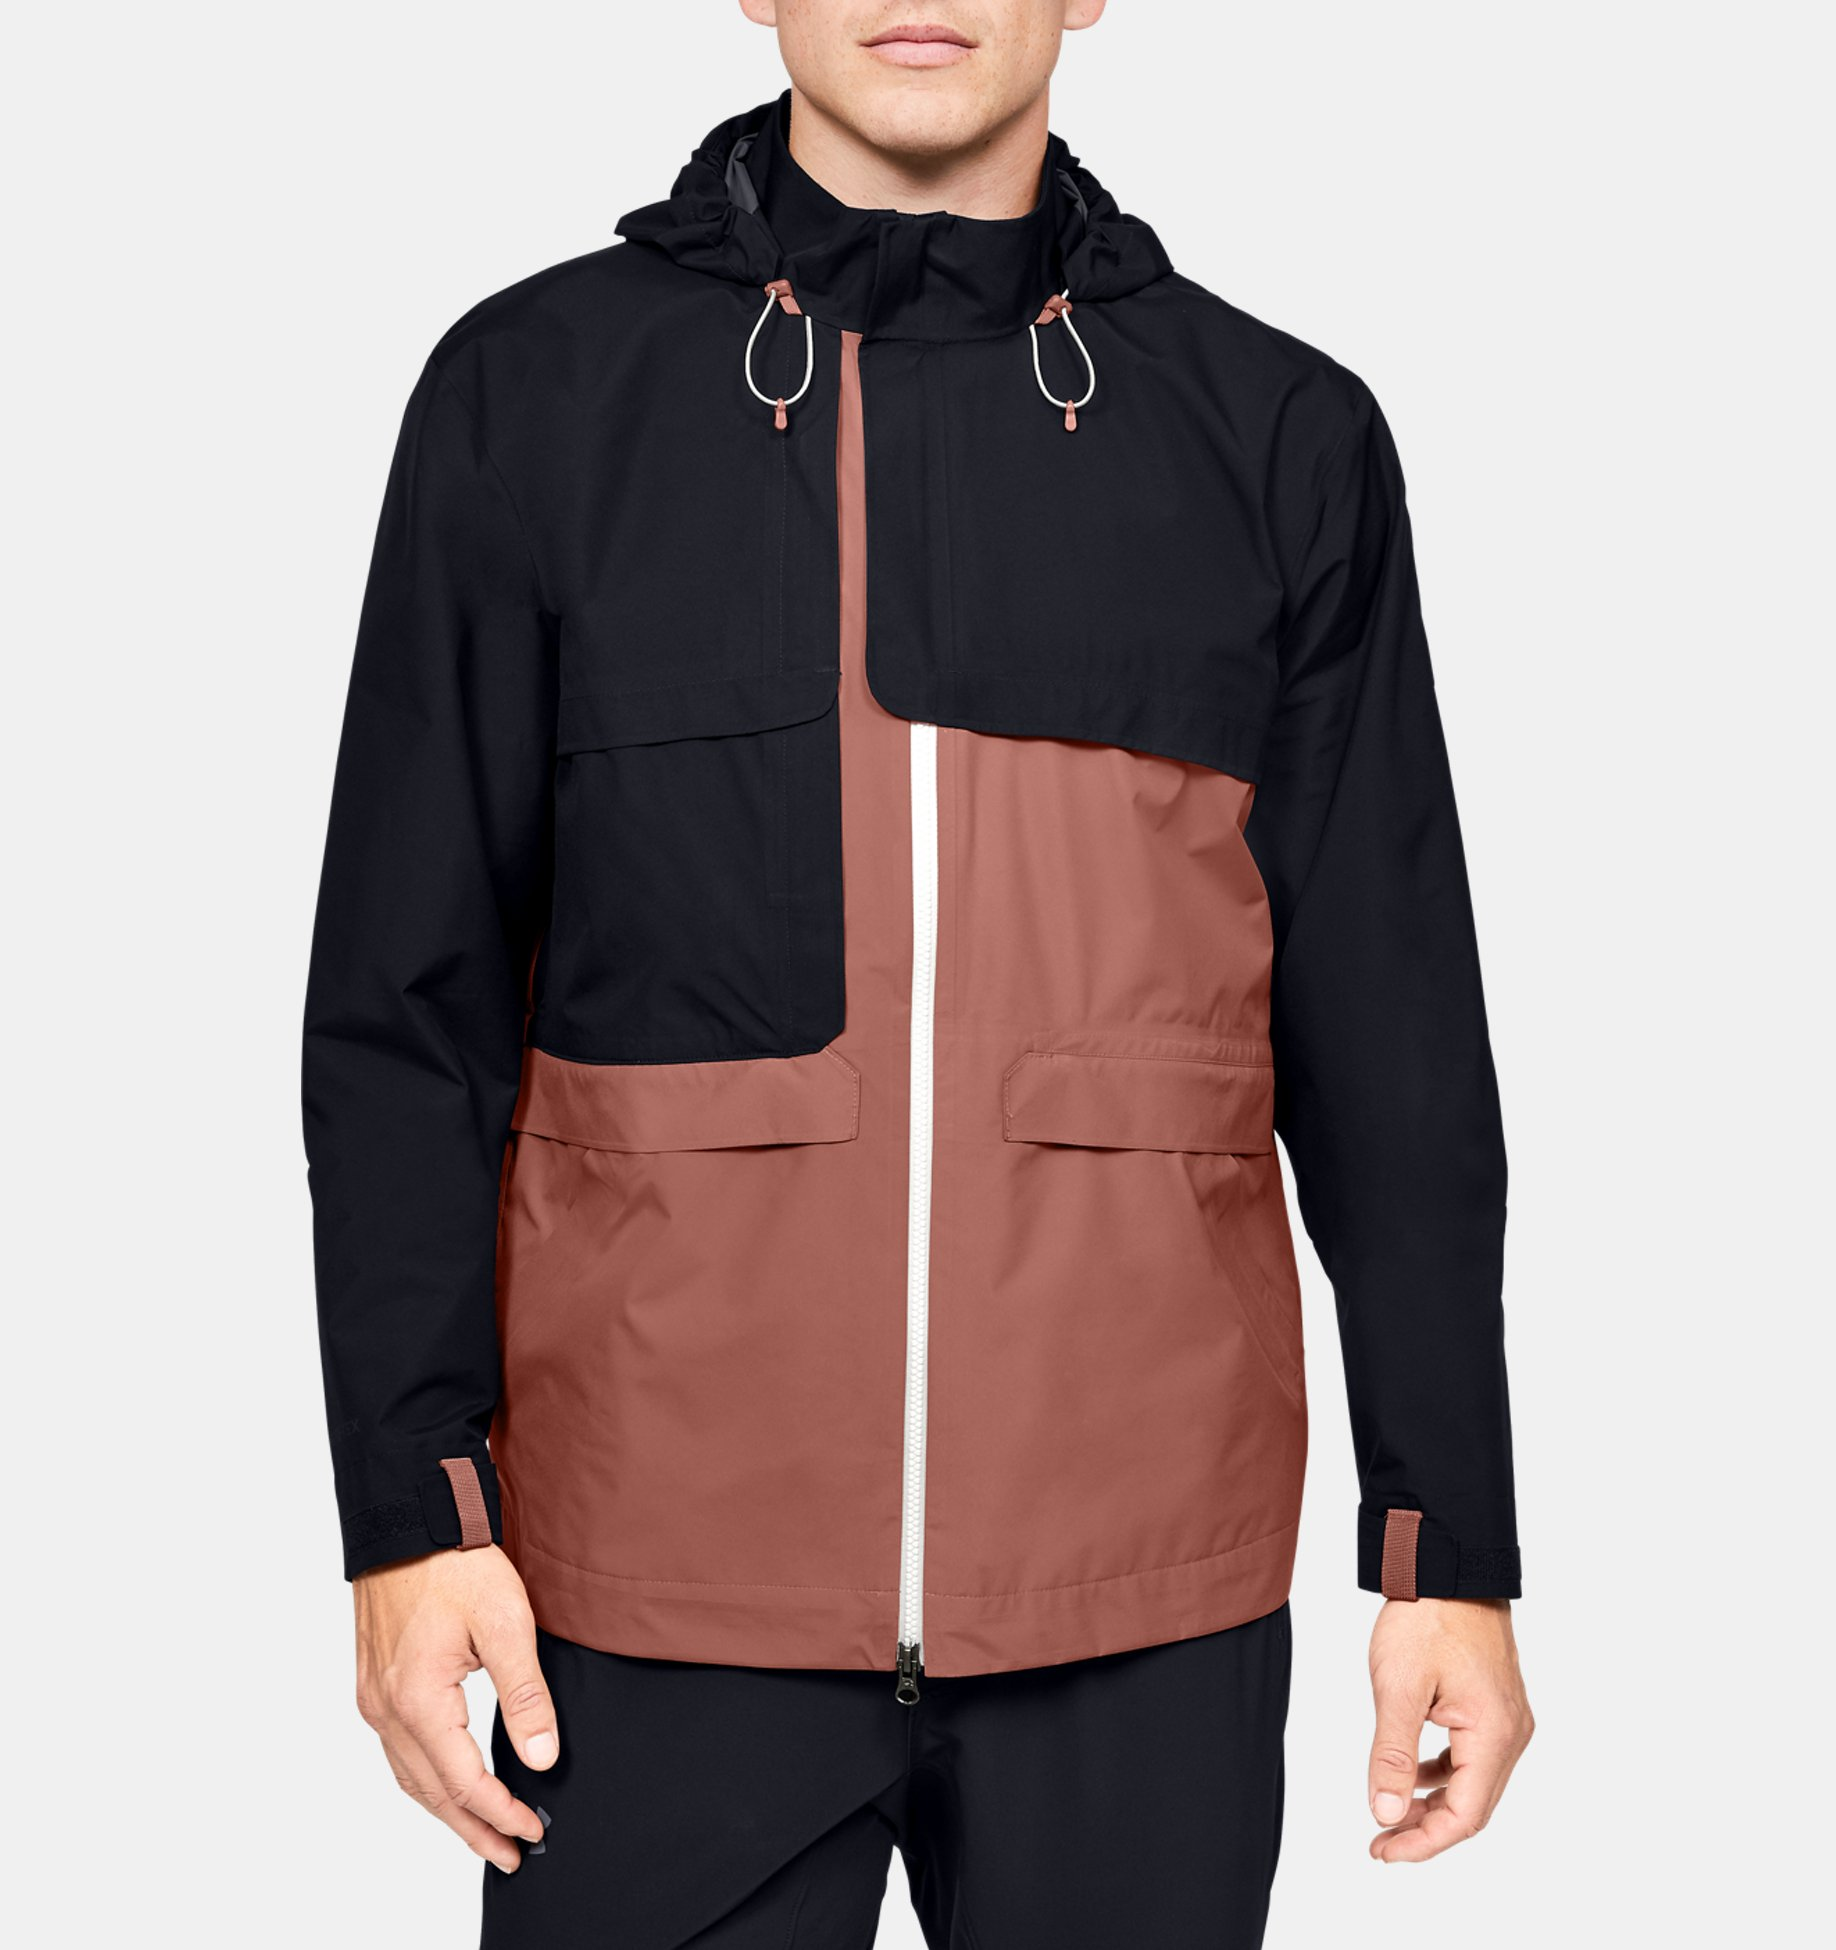 Underarmour Mens GORE-TEX Paclite Rain Jacket